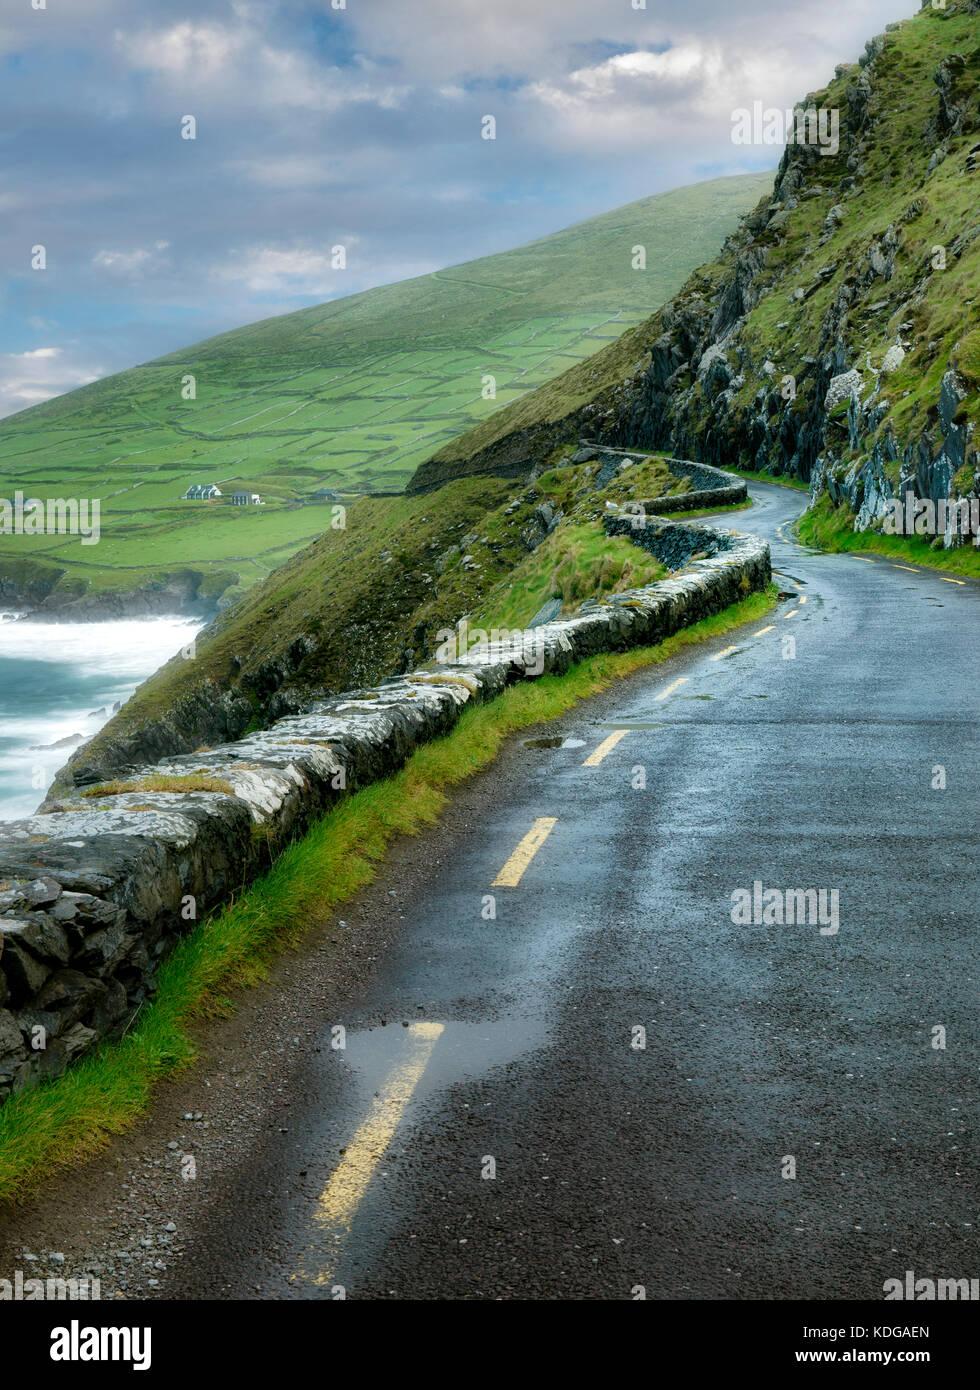 Slea Head road. County Kerry, Ireland - Stock Image